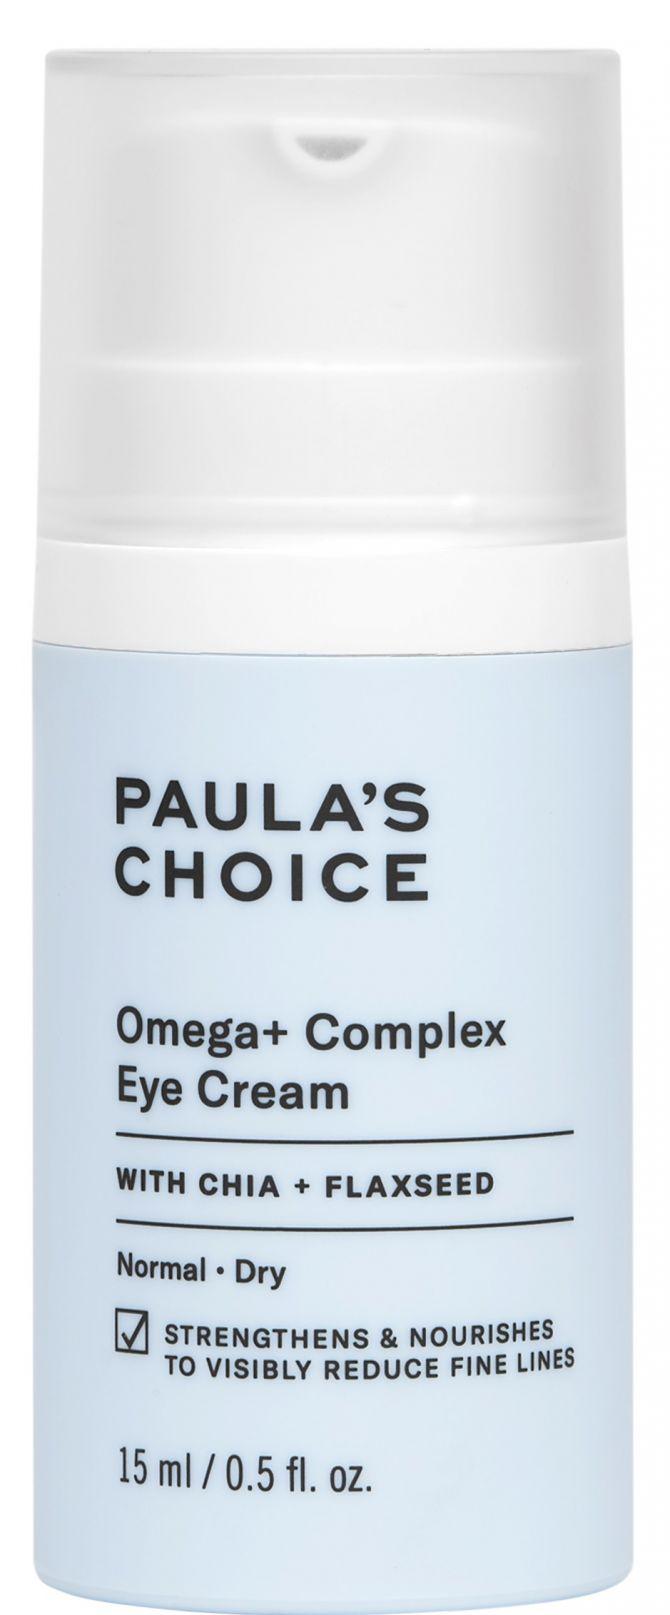 paula's choice eye cream